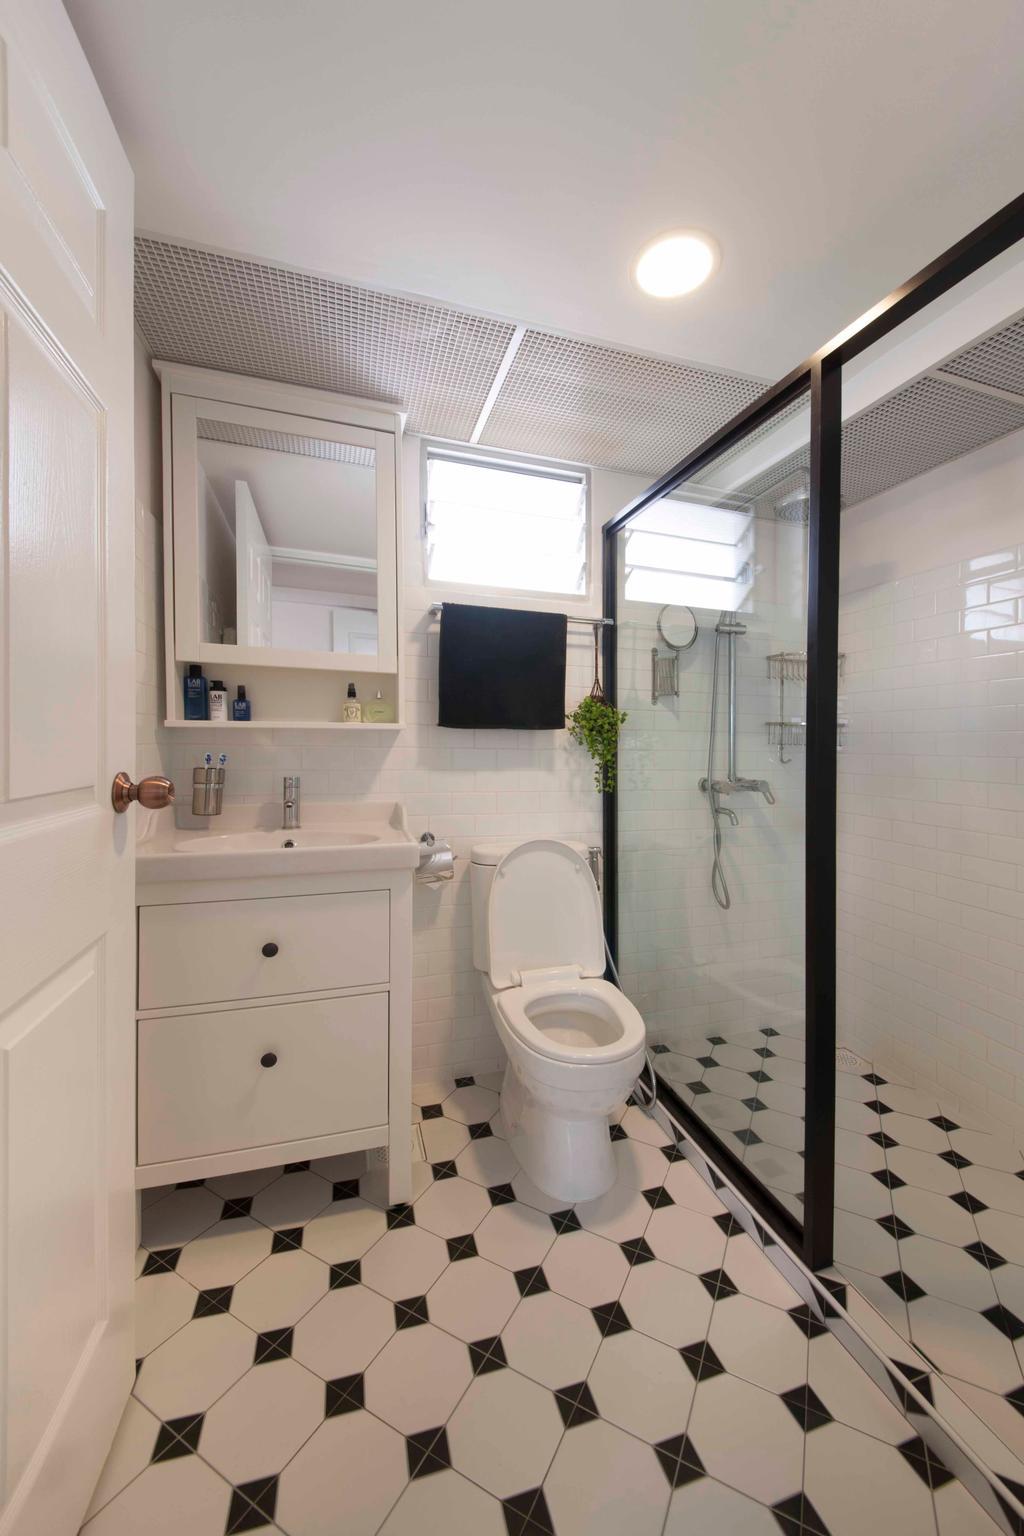 Eclectic, HDB, Bathroom, Sengkang (Block 469A), Interior Designer, DreamCreations Interior, Tiles, Floor Tiles, Bathroom Tiles, Bathroom Vanity, Mirror, Shower Area, Indoors, Interior Design, Room